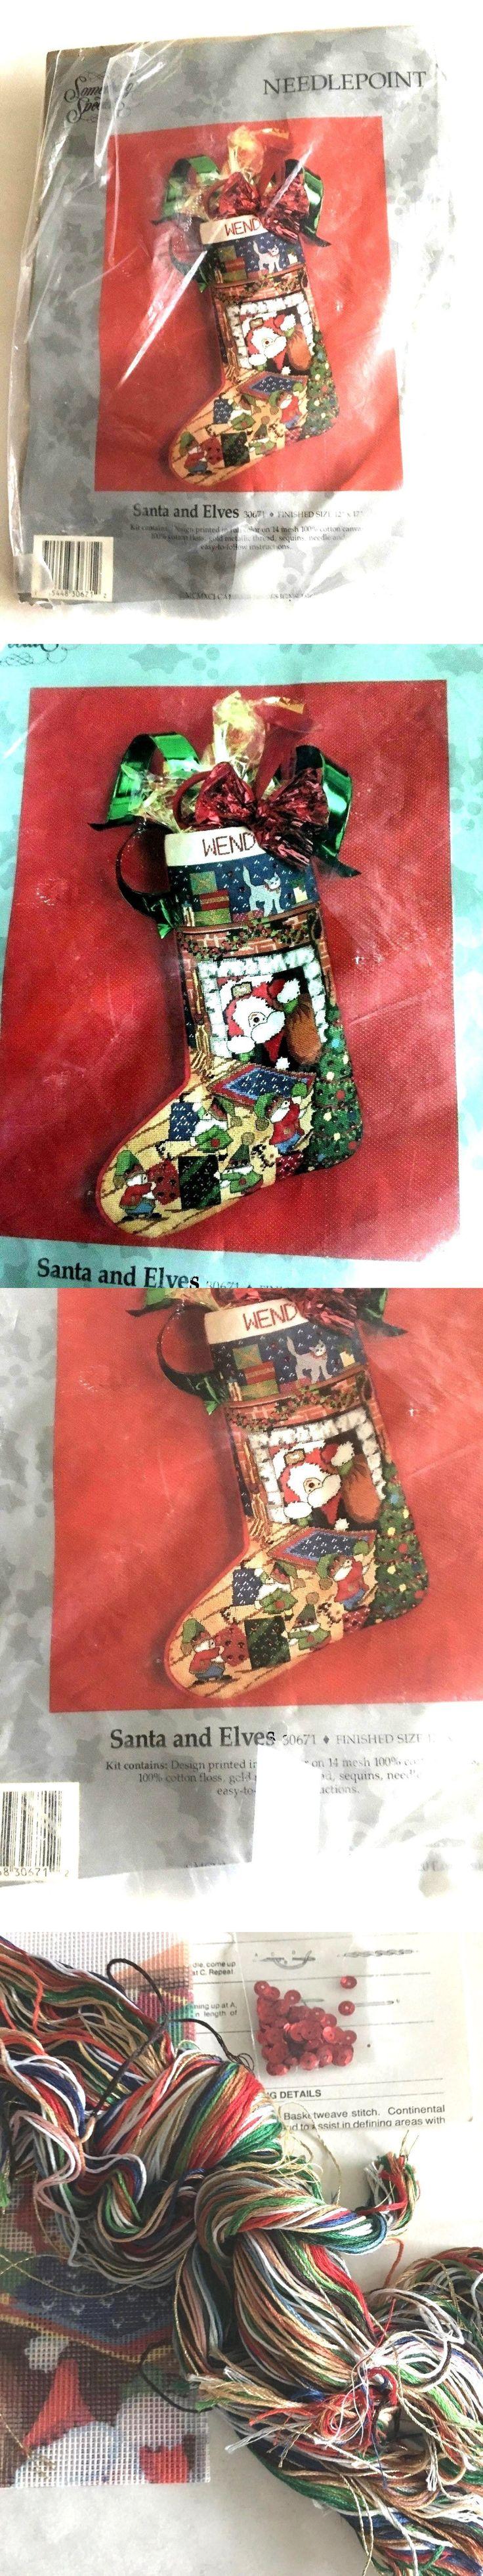 Needlepoint Kits 3109: Candamar Designs, Something Special, Christmas, Needlepoint Stocking Craft, San -> BUY IT NOW ONLY: $59.99 on eBay!